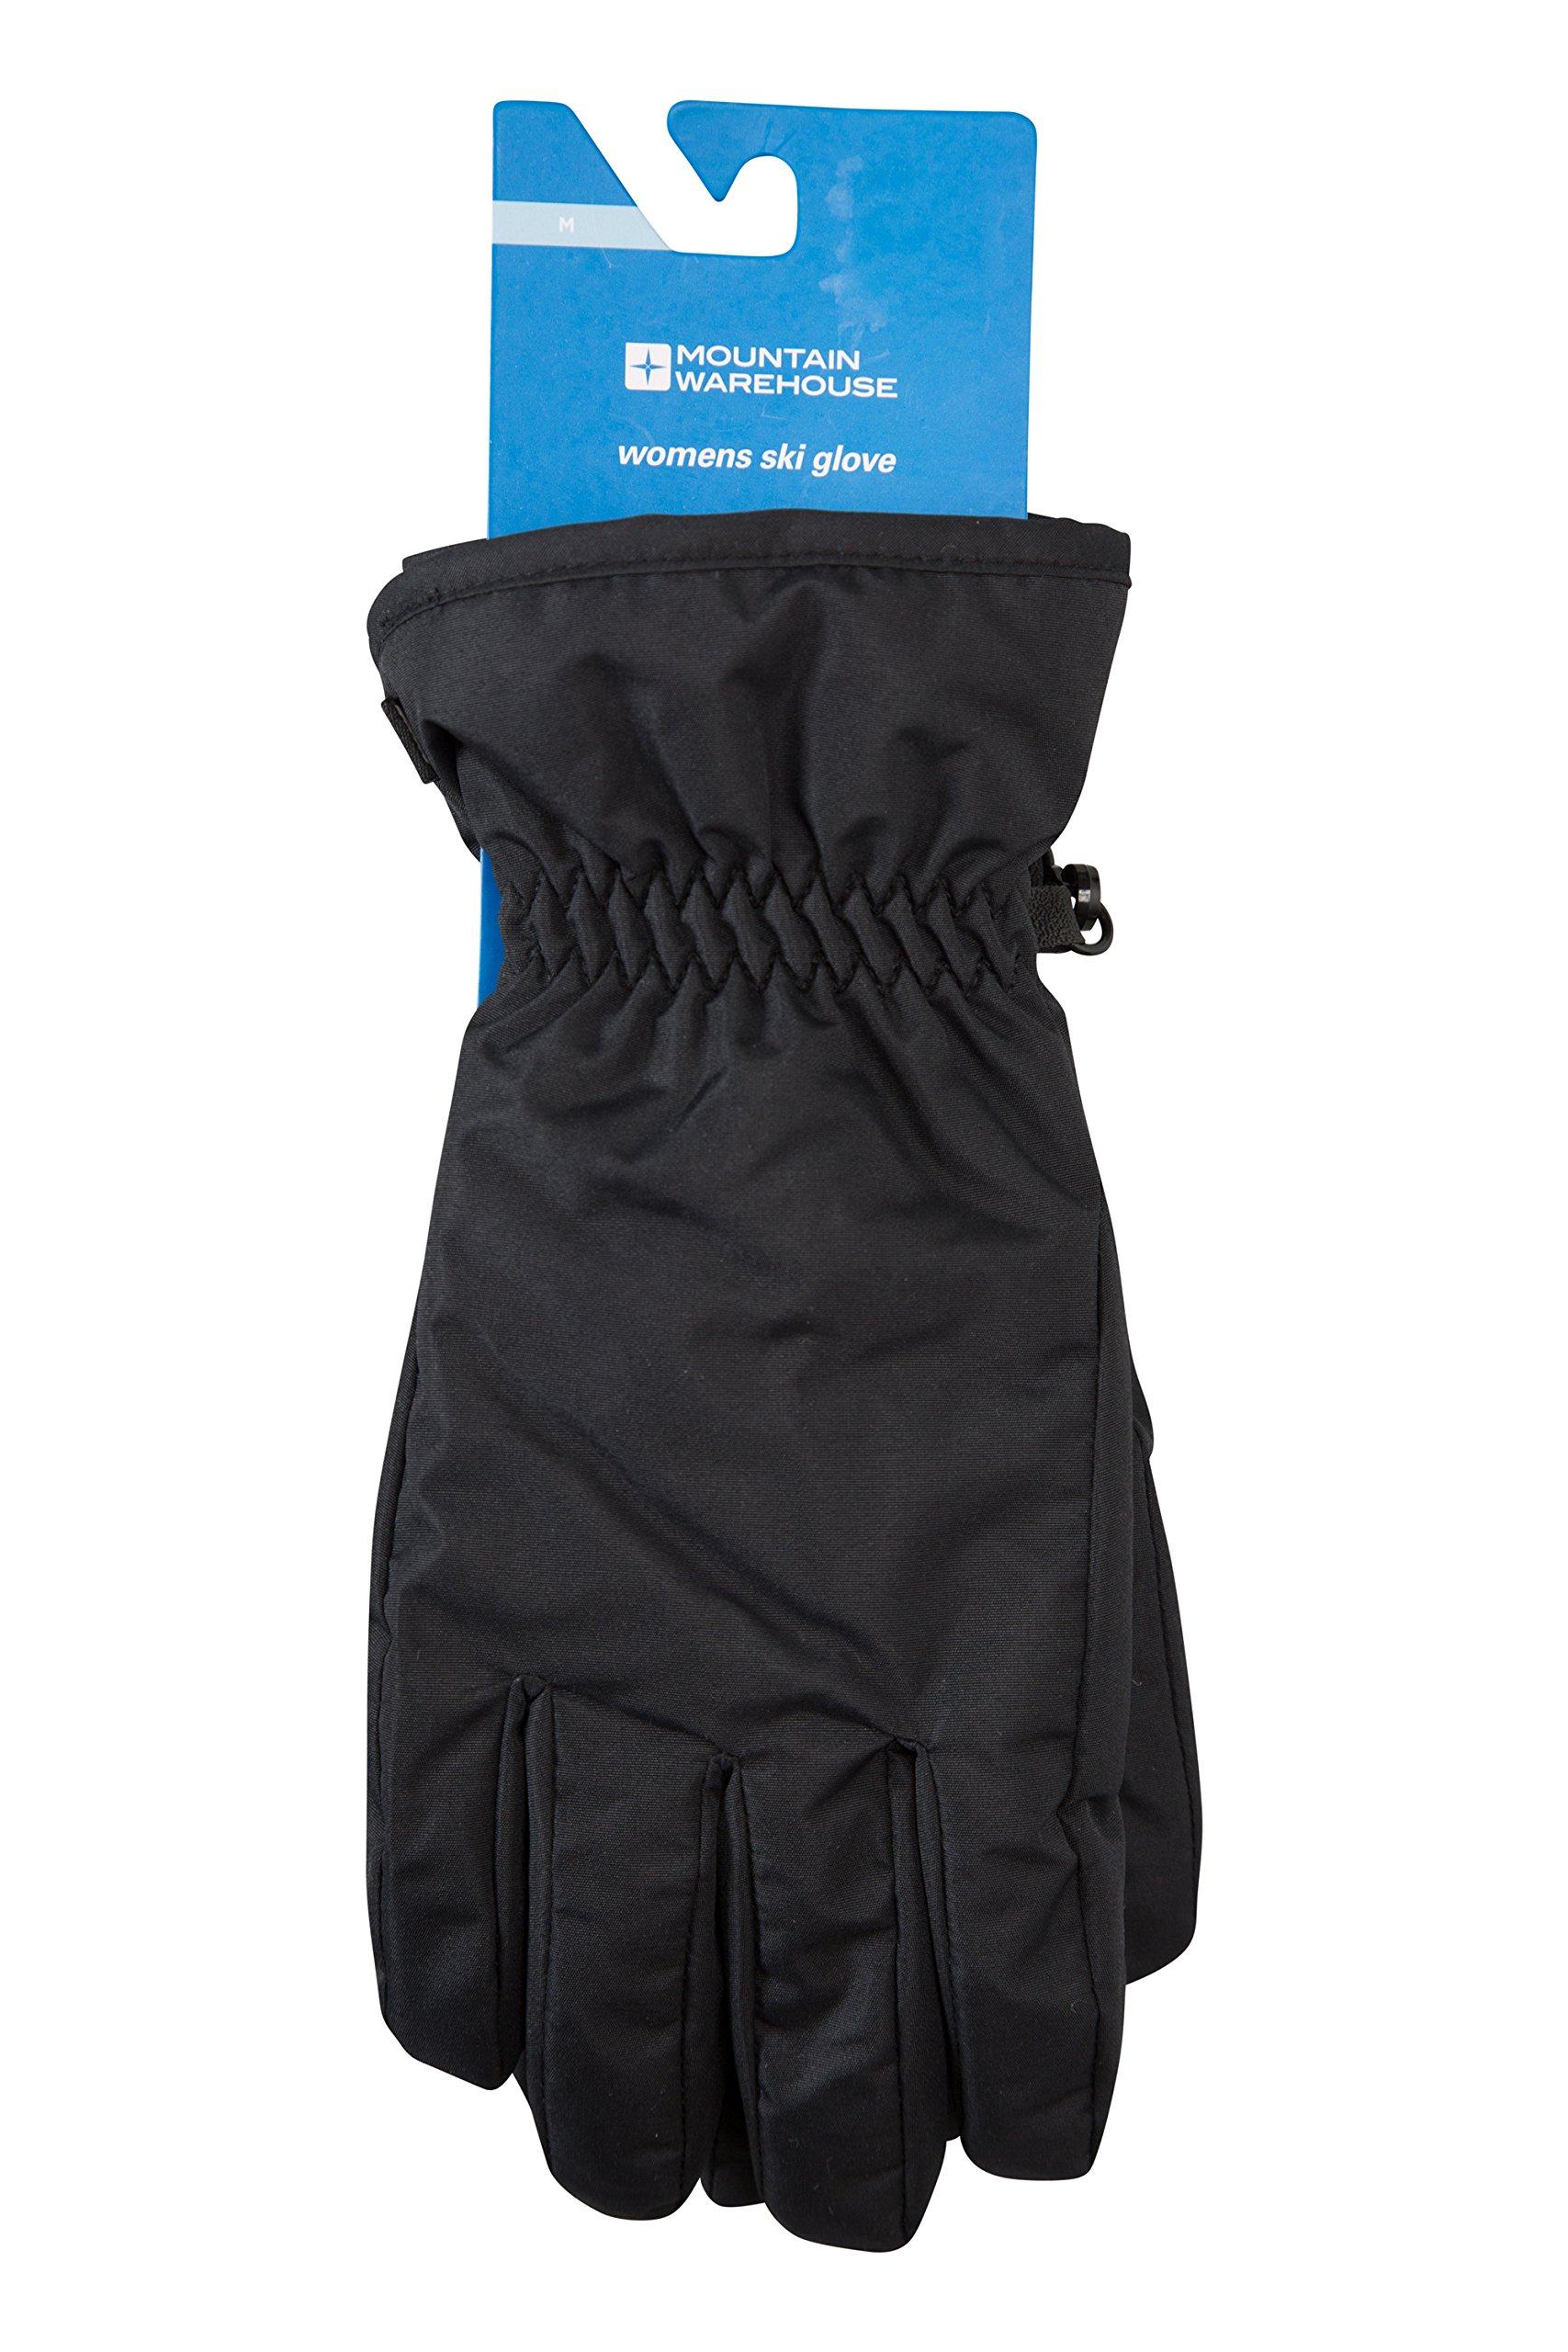 Winter Toddler Snow Gloves 2-6 Years Old Children 3M Thinsulate Warm Gloves Skiing Snowboarding Waterproof Windproof Fazitrip Kids Ski Mittens for Girls Boys